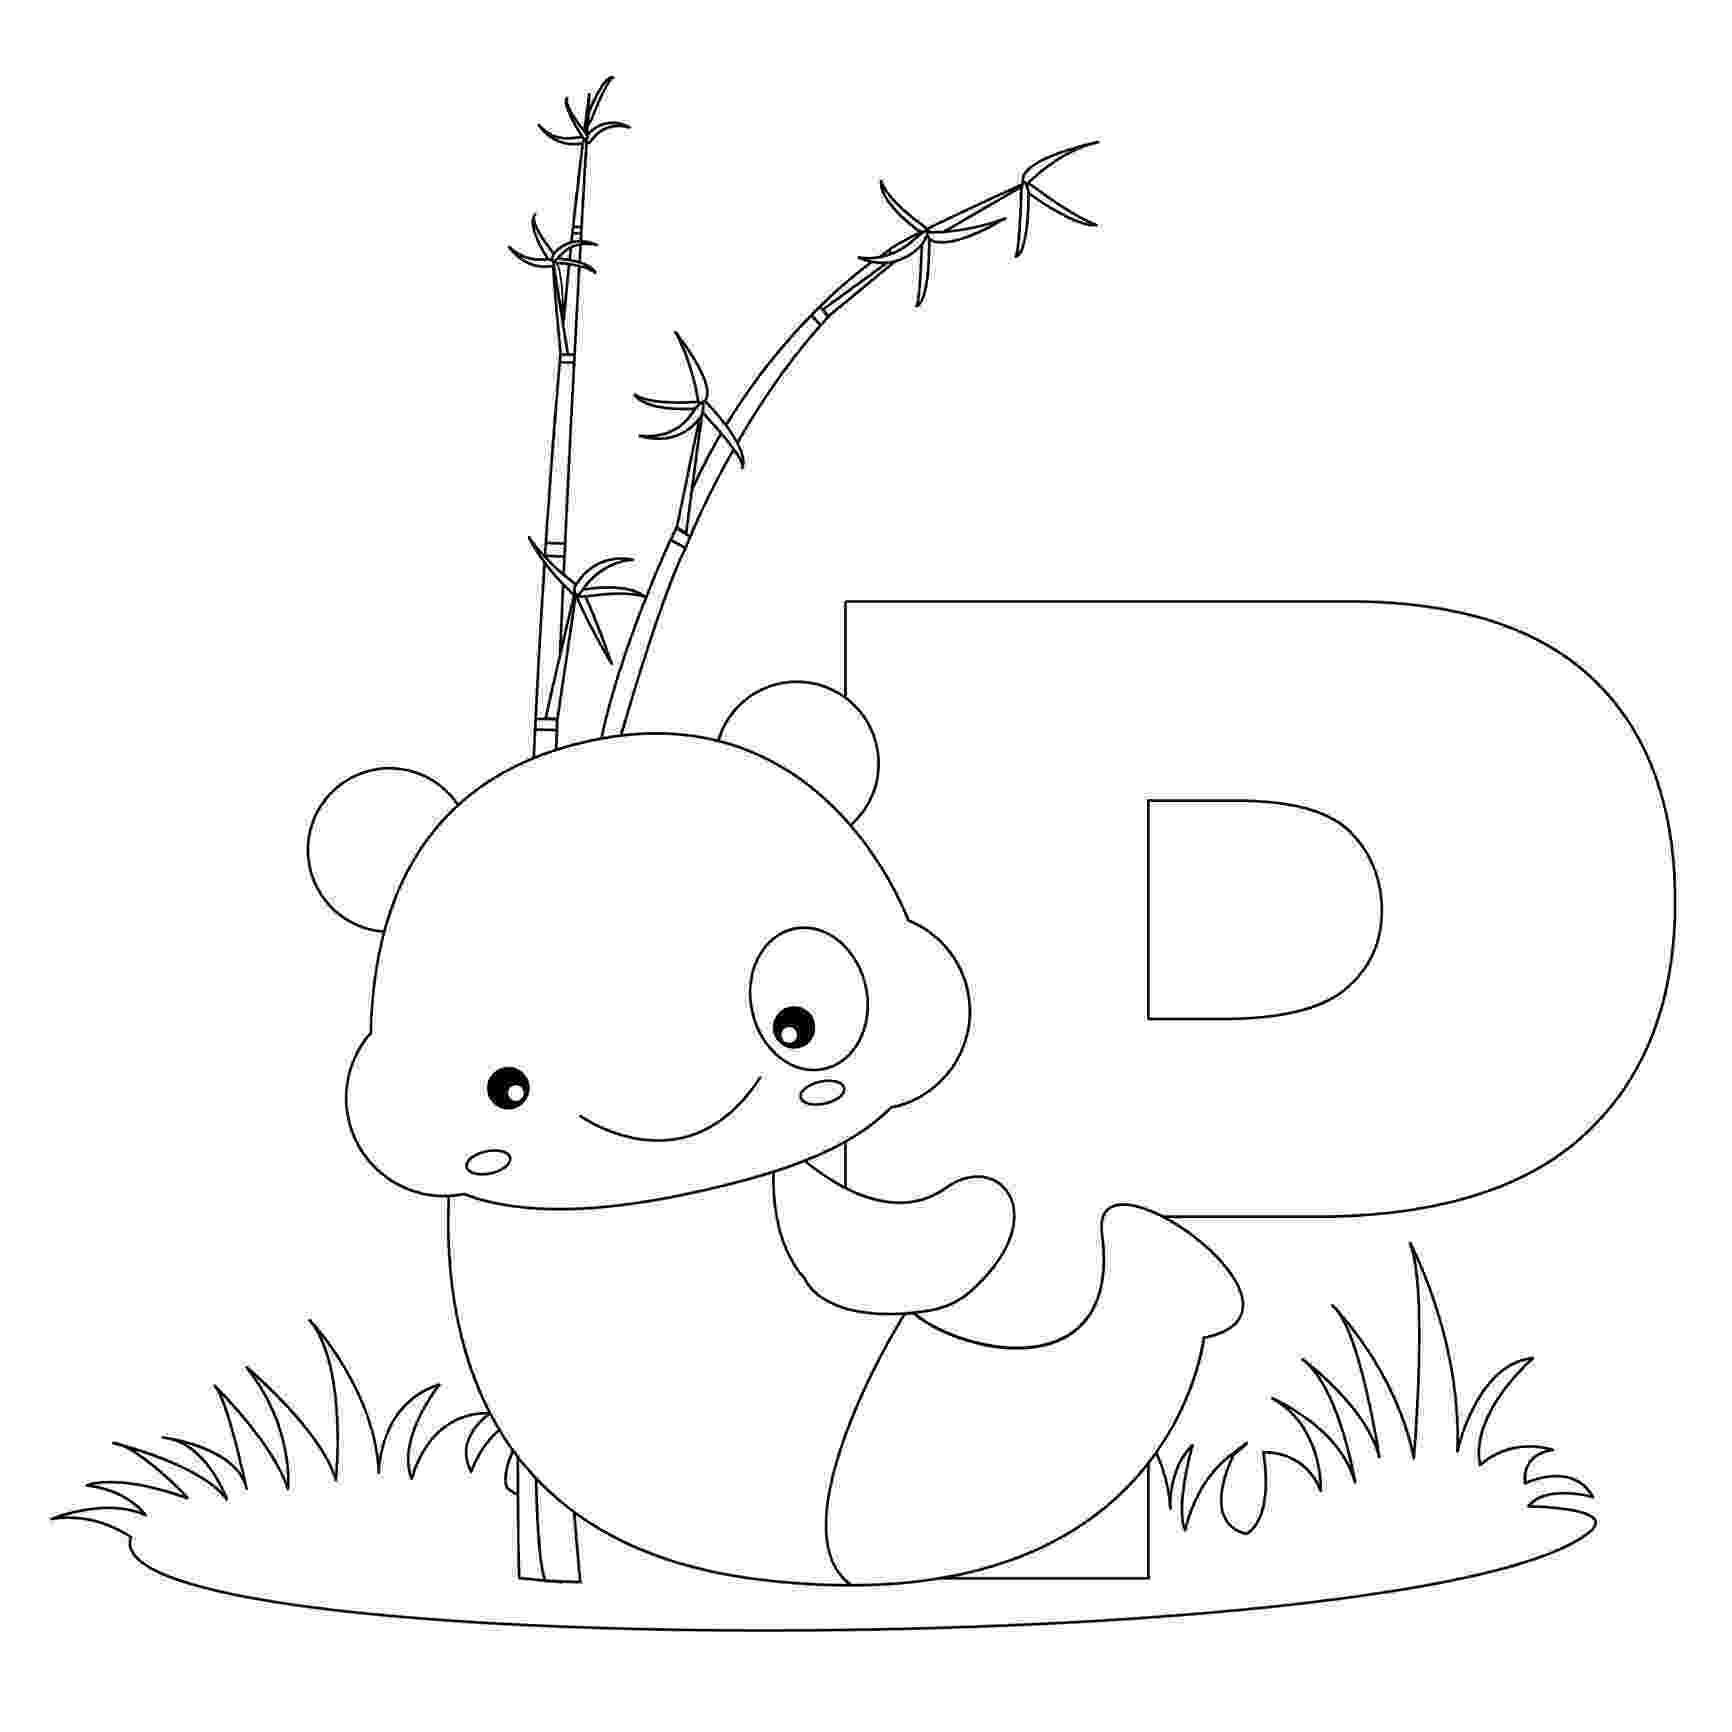 alphabet coloring worksheets free printable alphabet coloring pages for kids best coloring alphabet worksheets 1 4